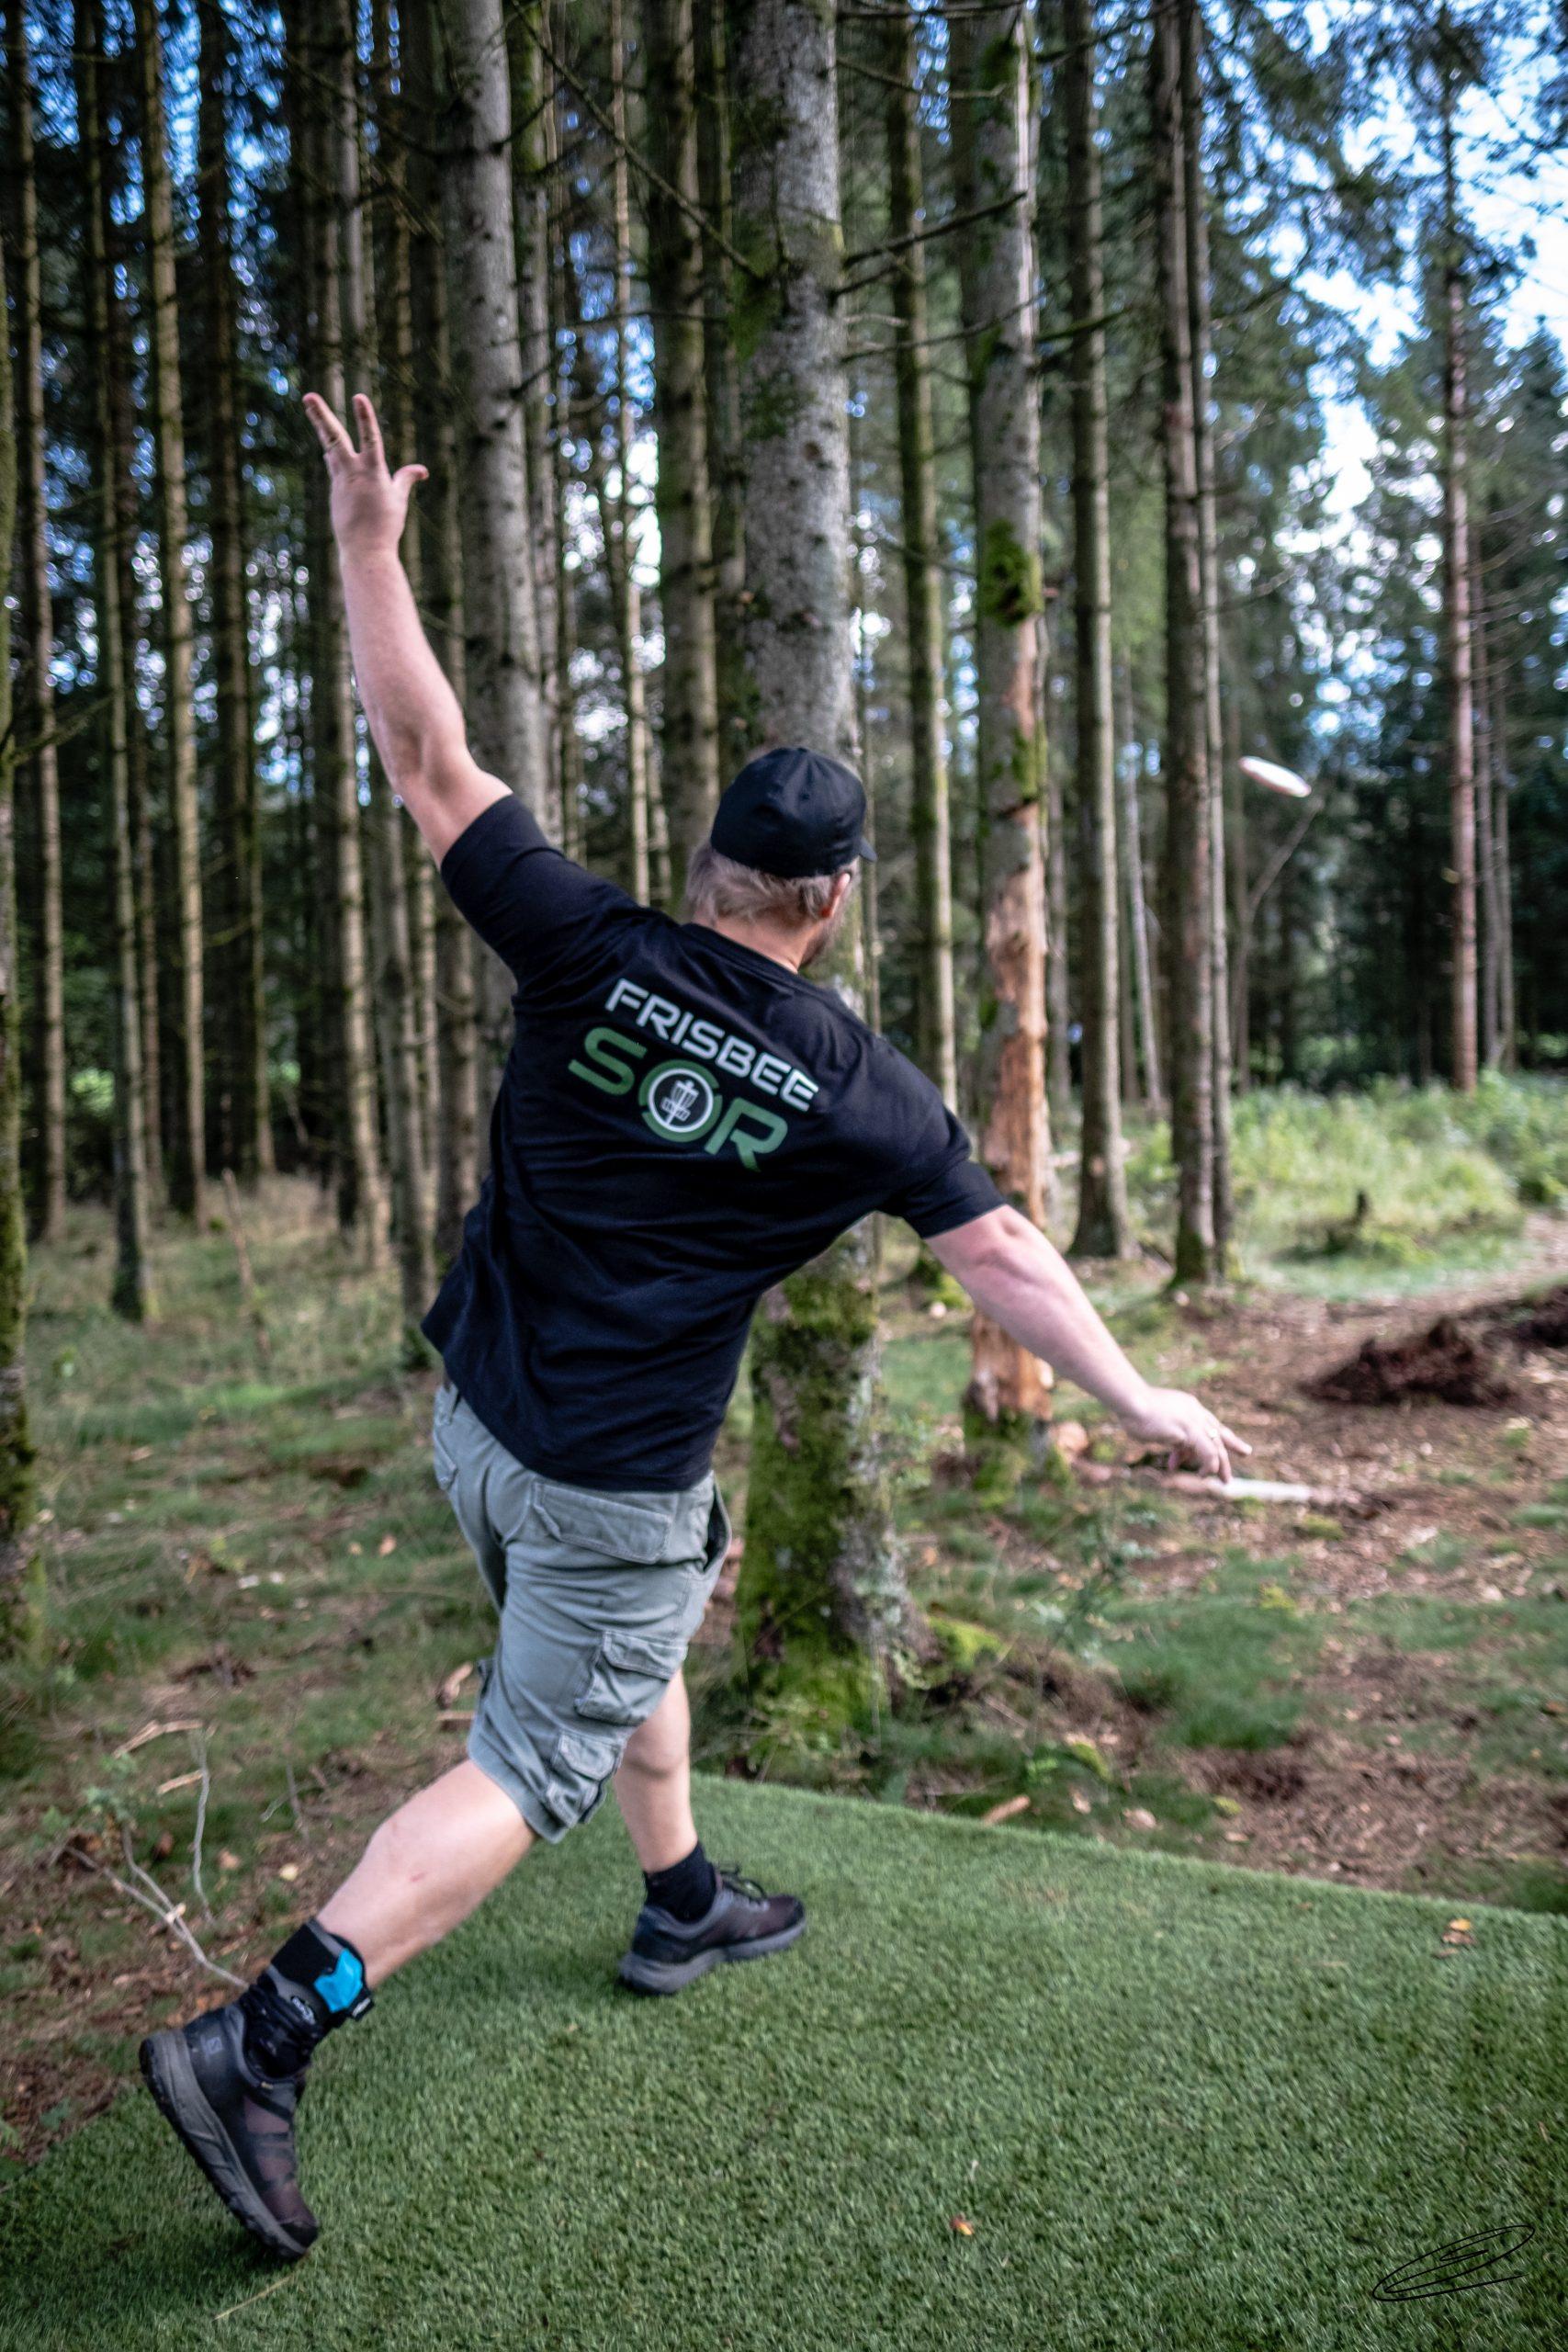 Rick Bra scaled Frisbeesor.no